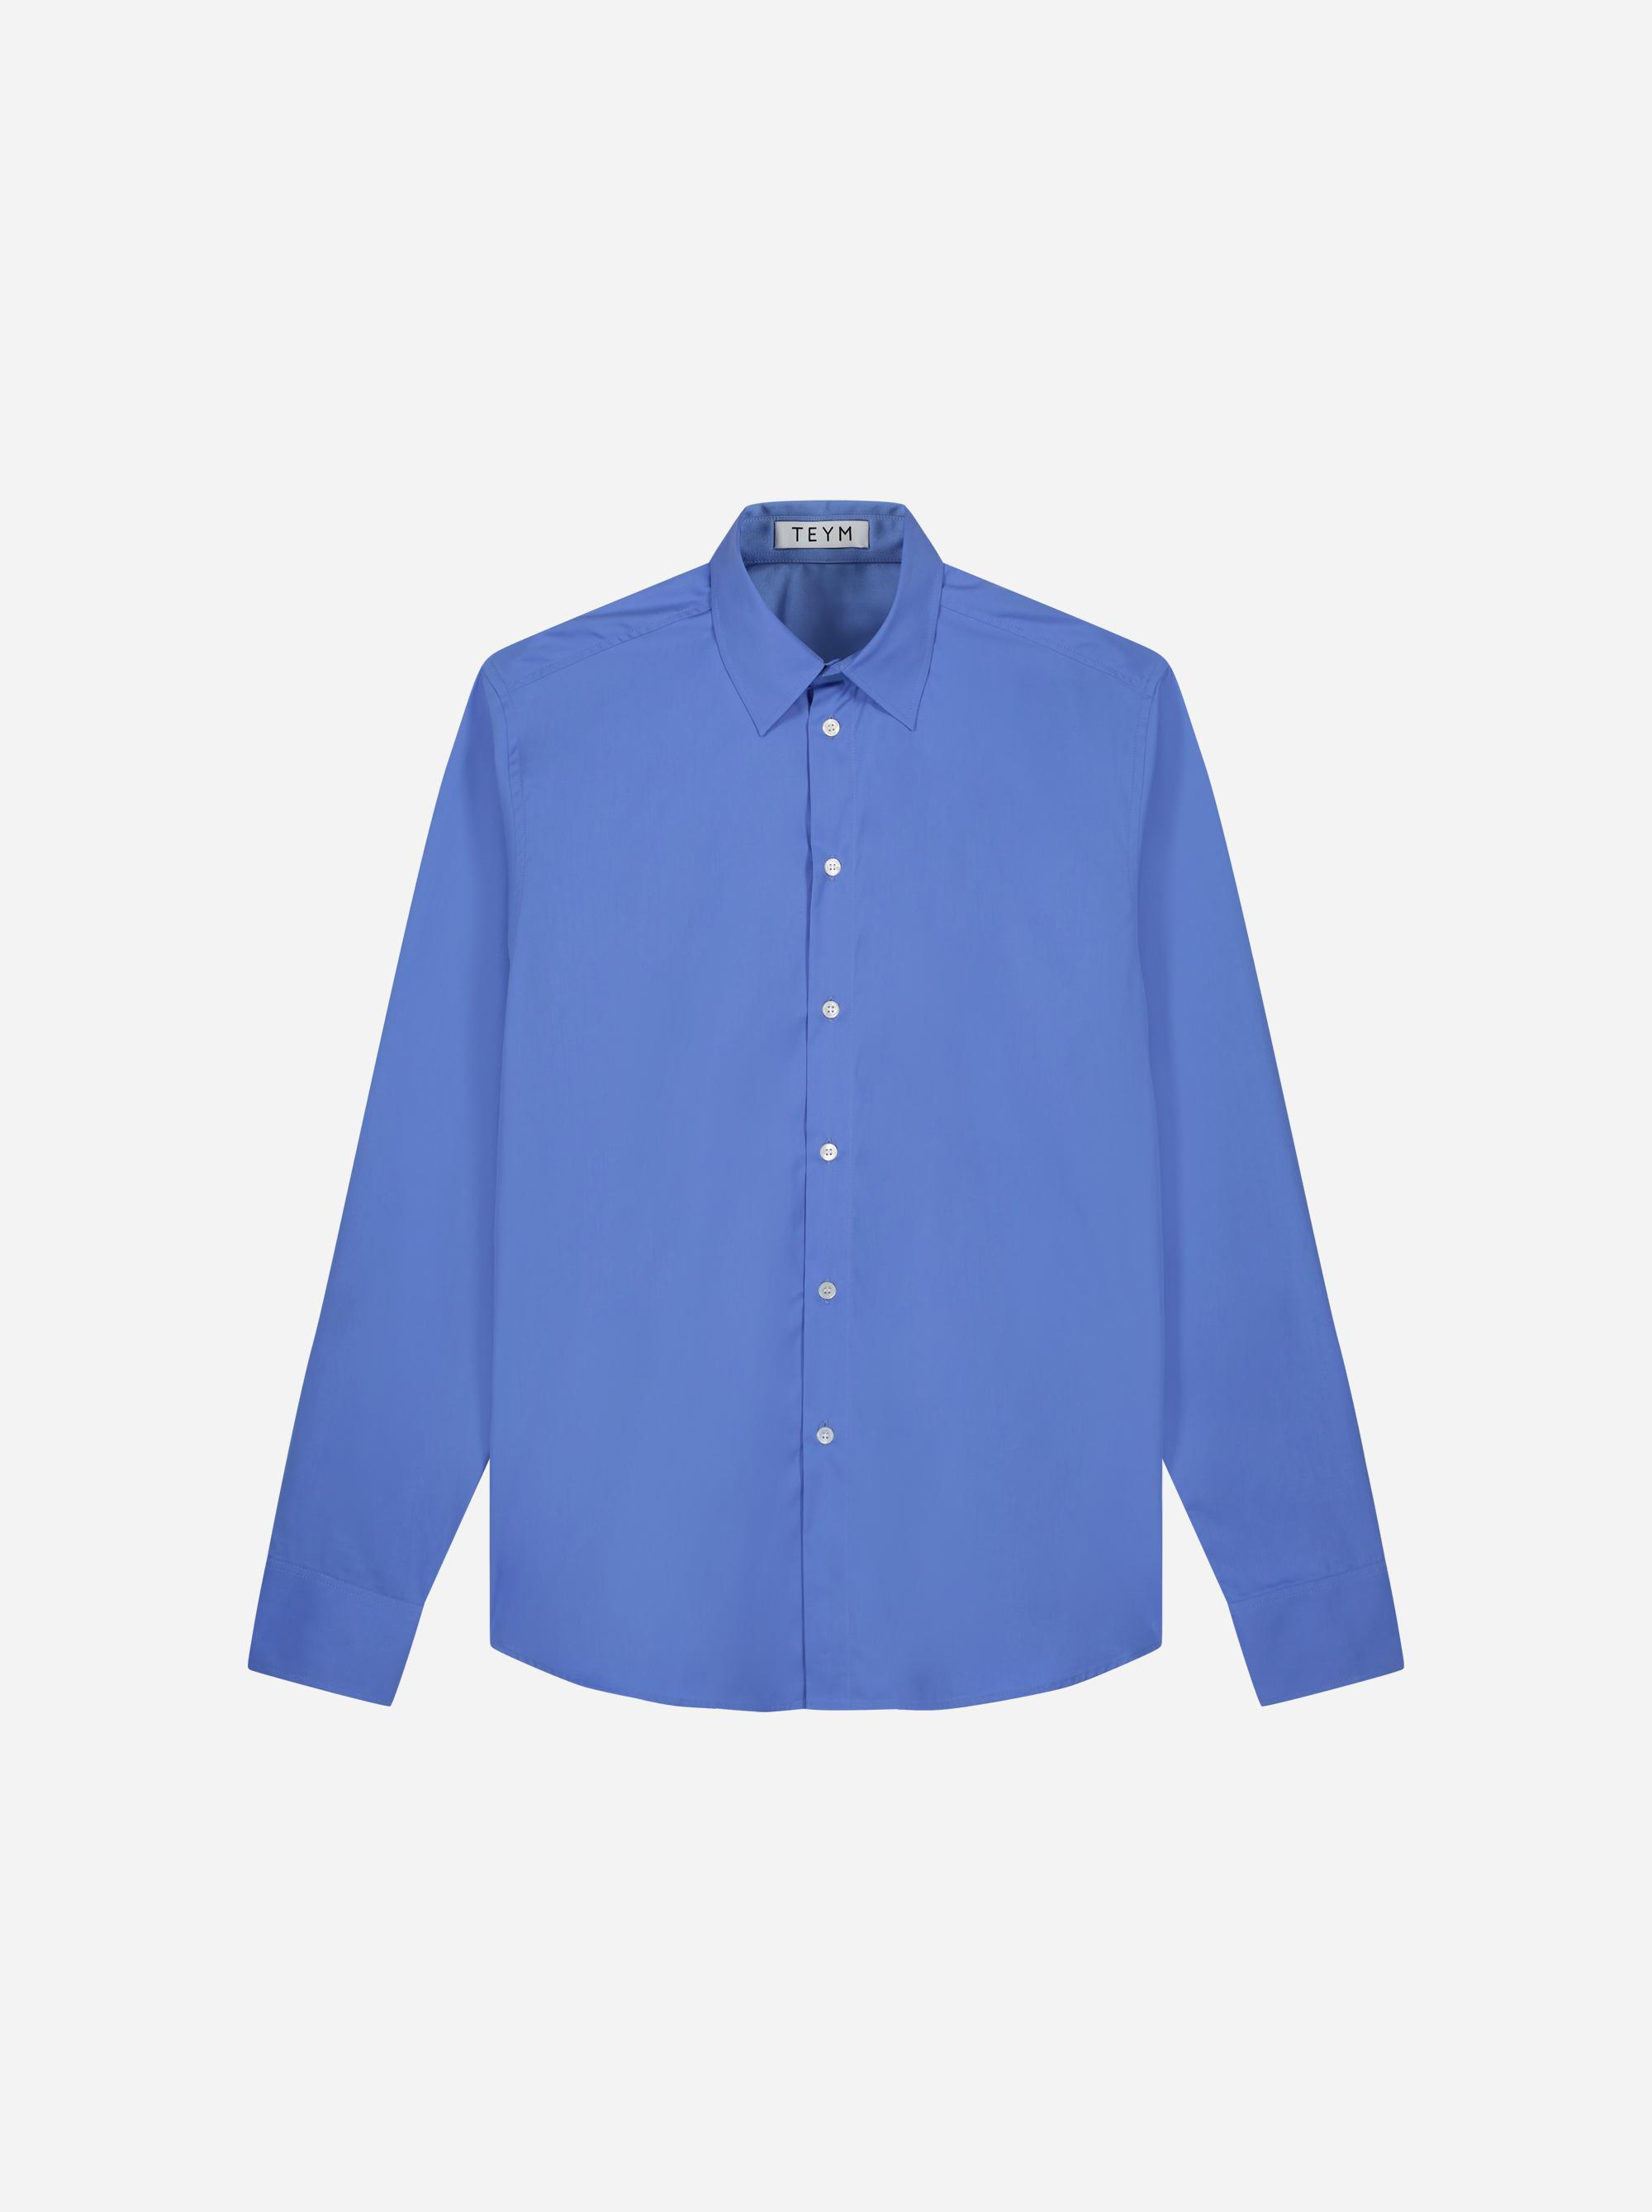 Teym_Shirt_Blue_Men_front_1B